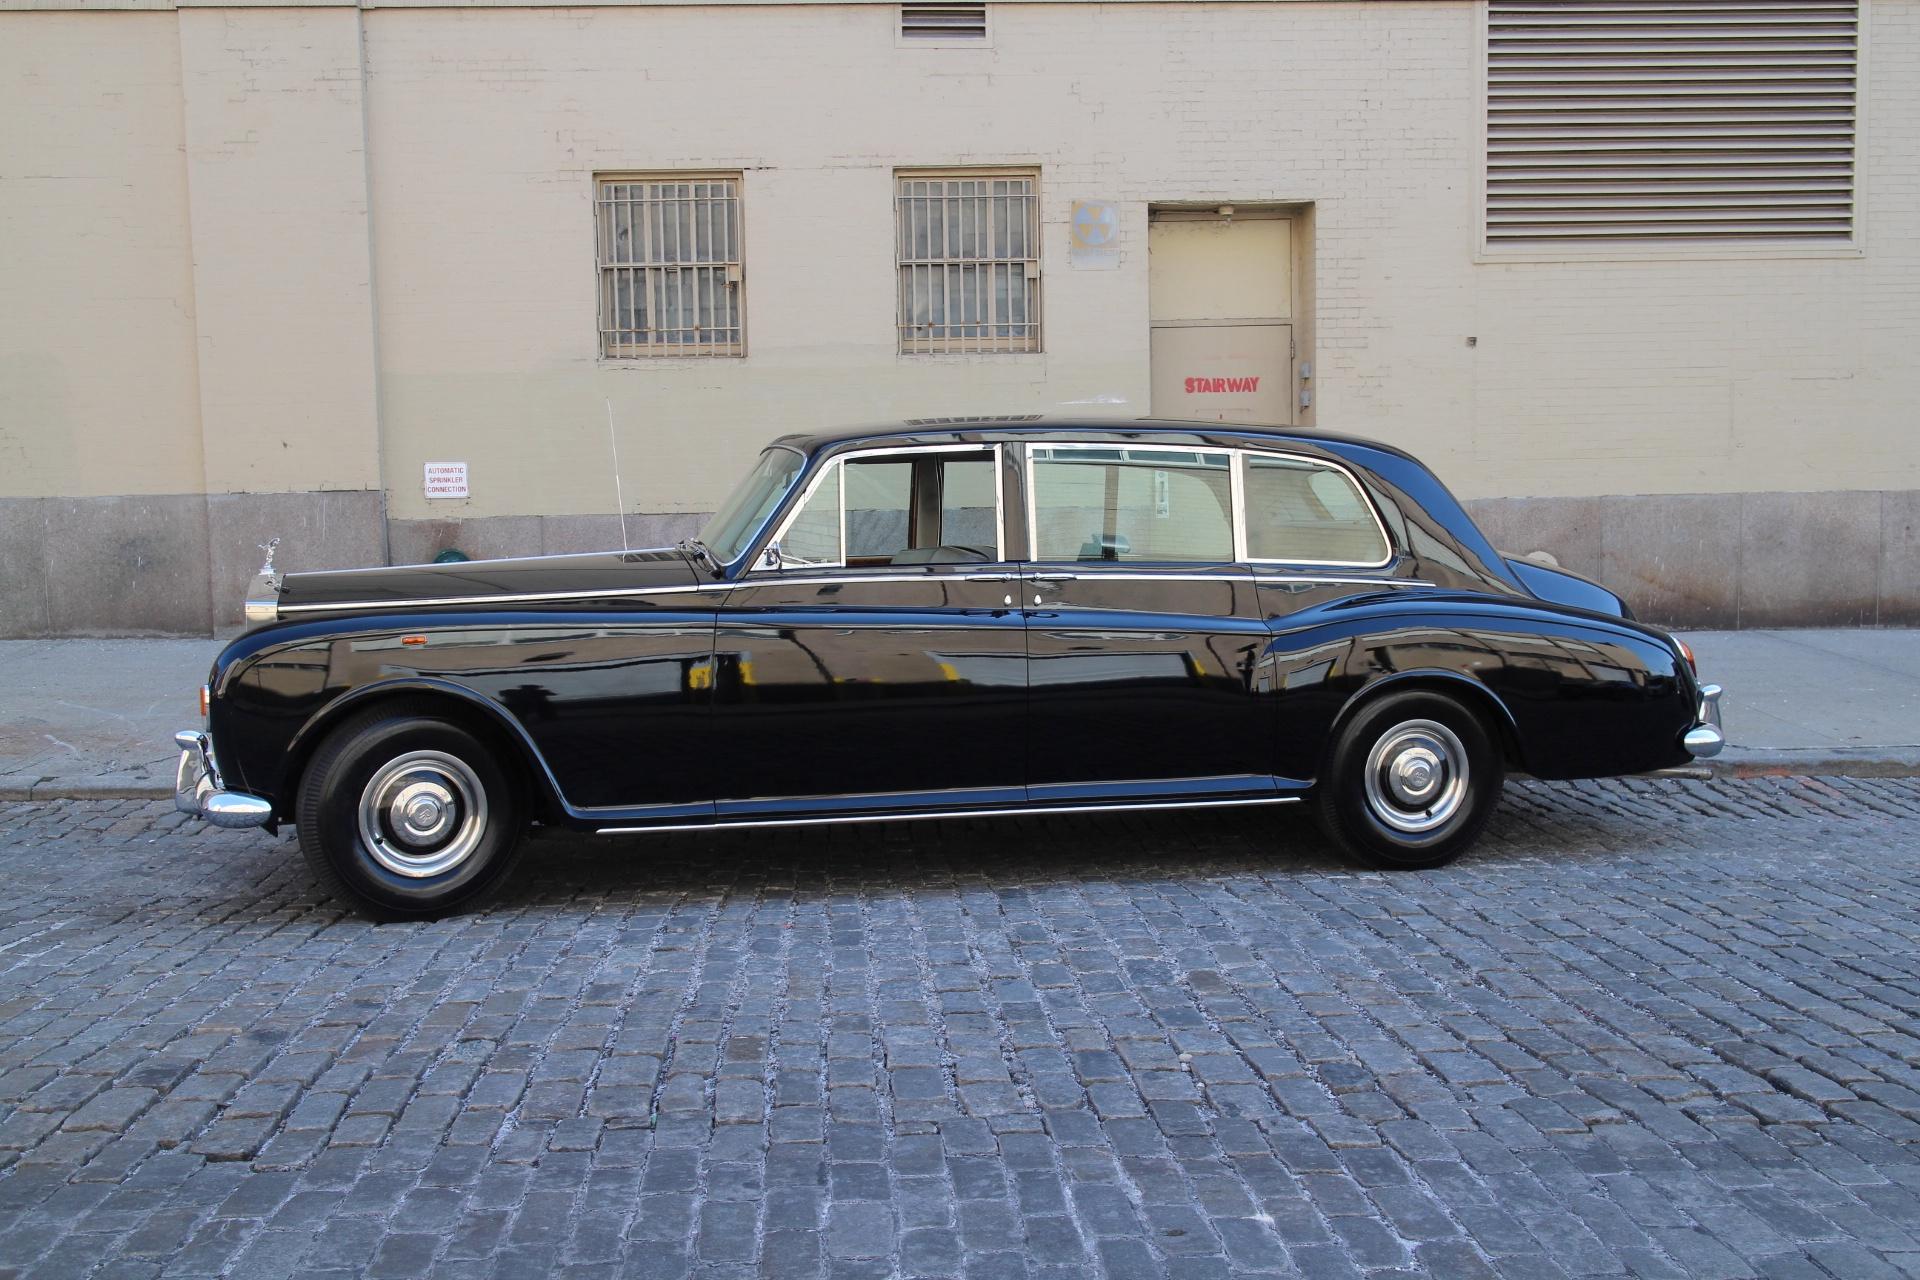 1965 Rolls Royce Phantom V Stock 740 for sale near New York NY